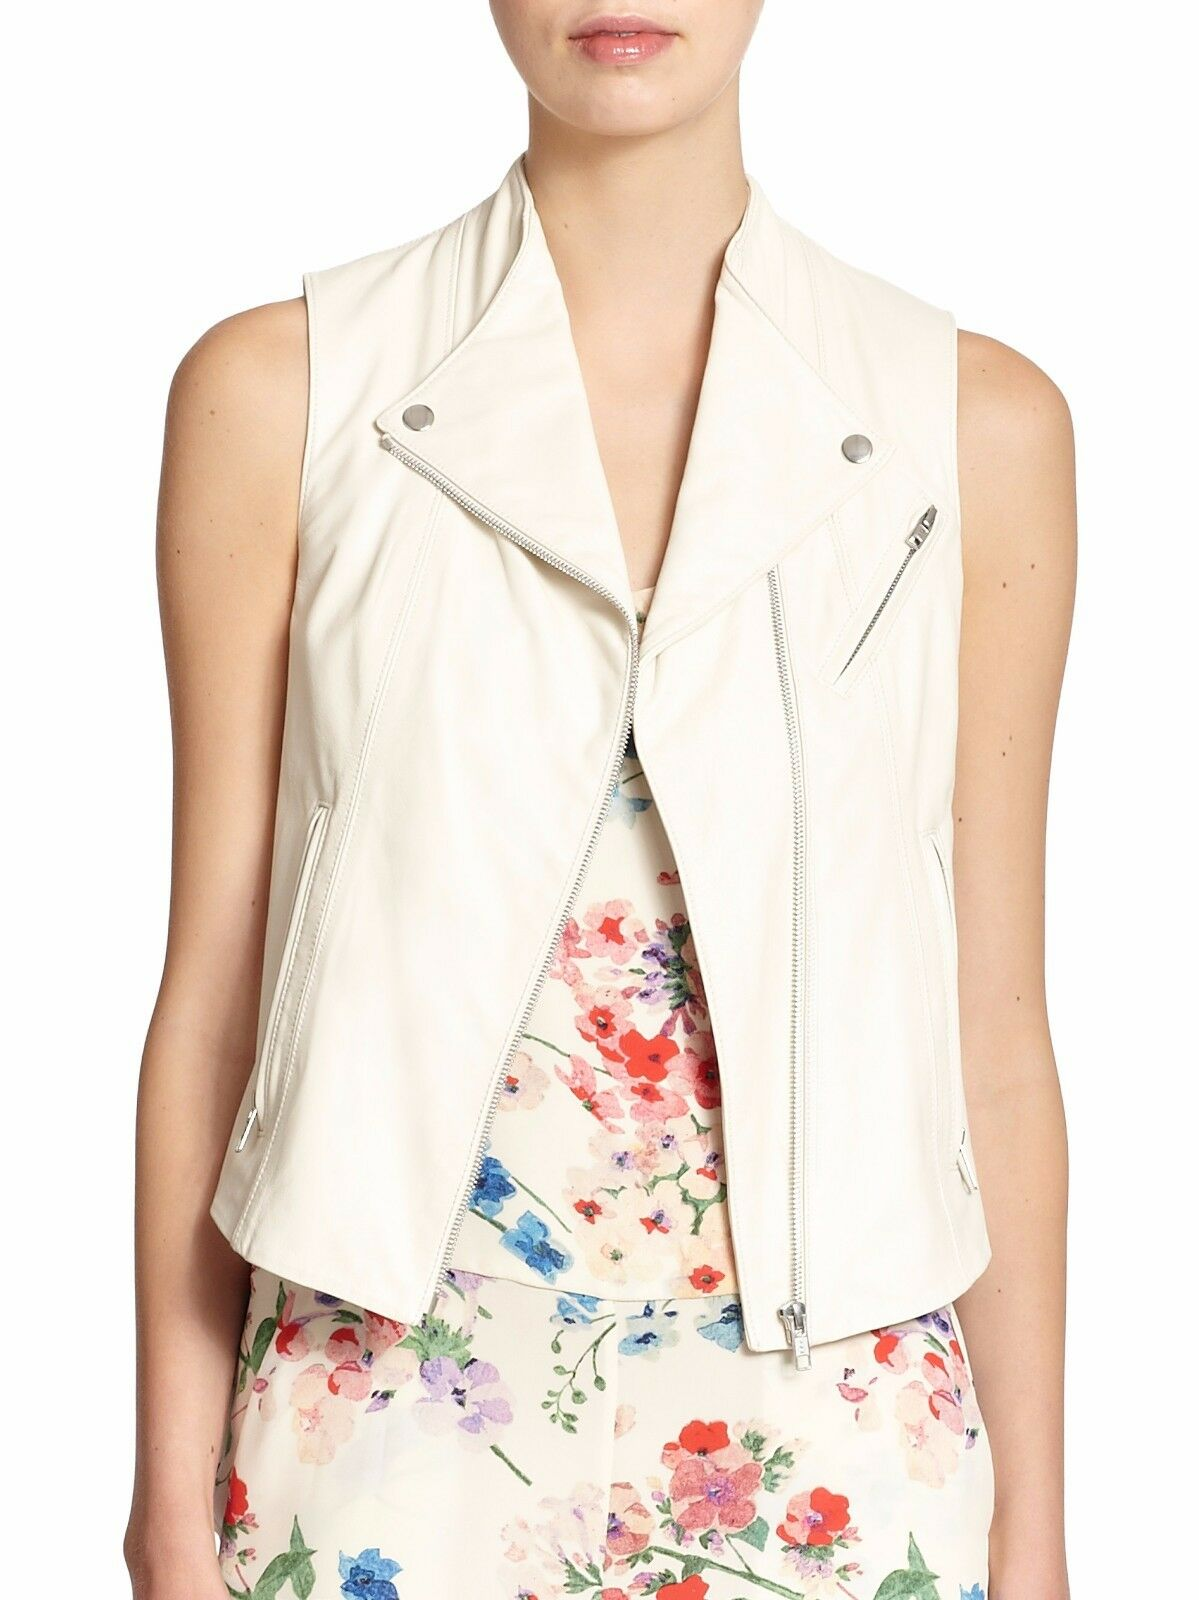 855 Brand New Theory Zita Leather Moto Vest White Women Helmut Lang Vince